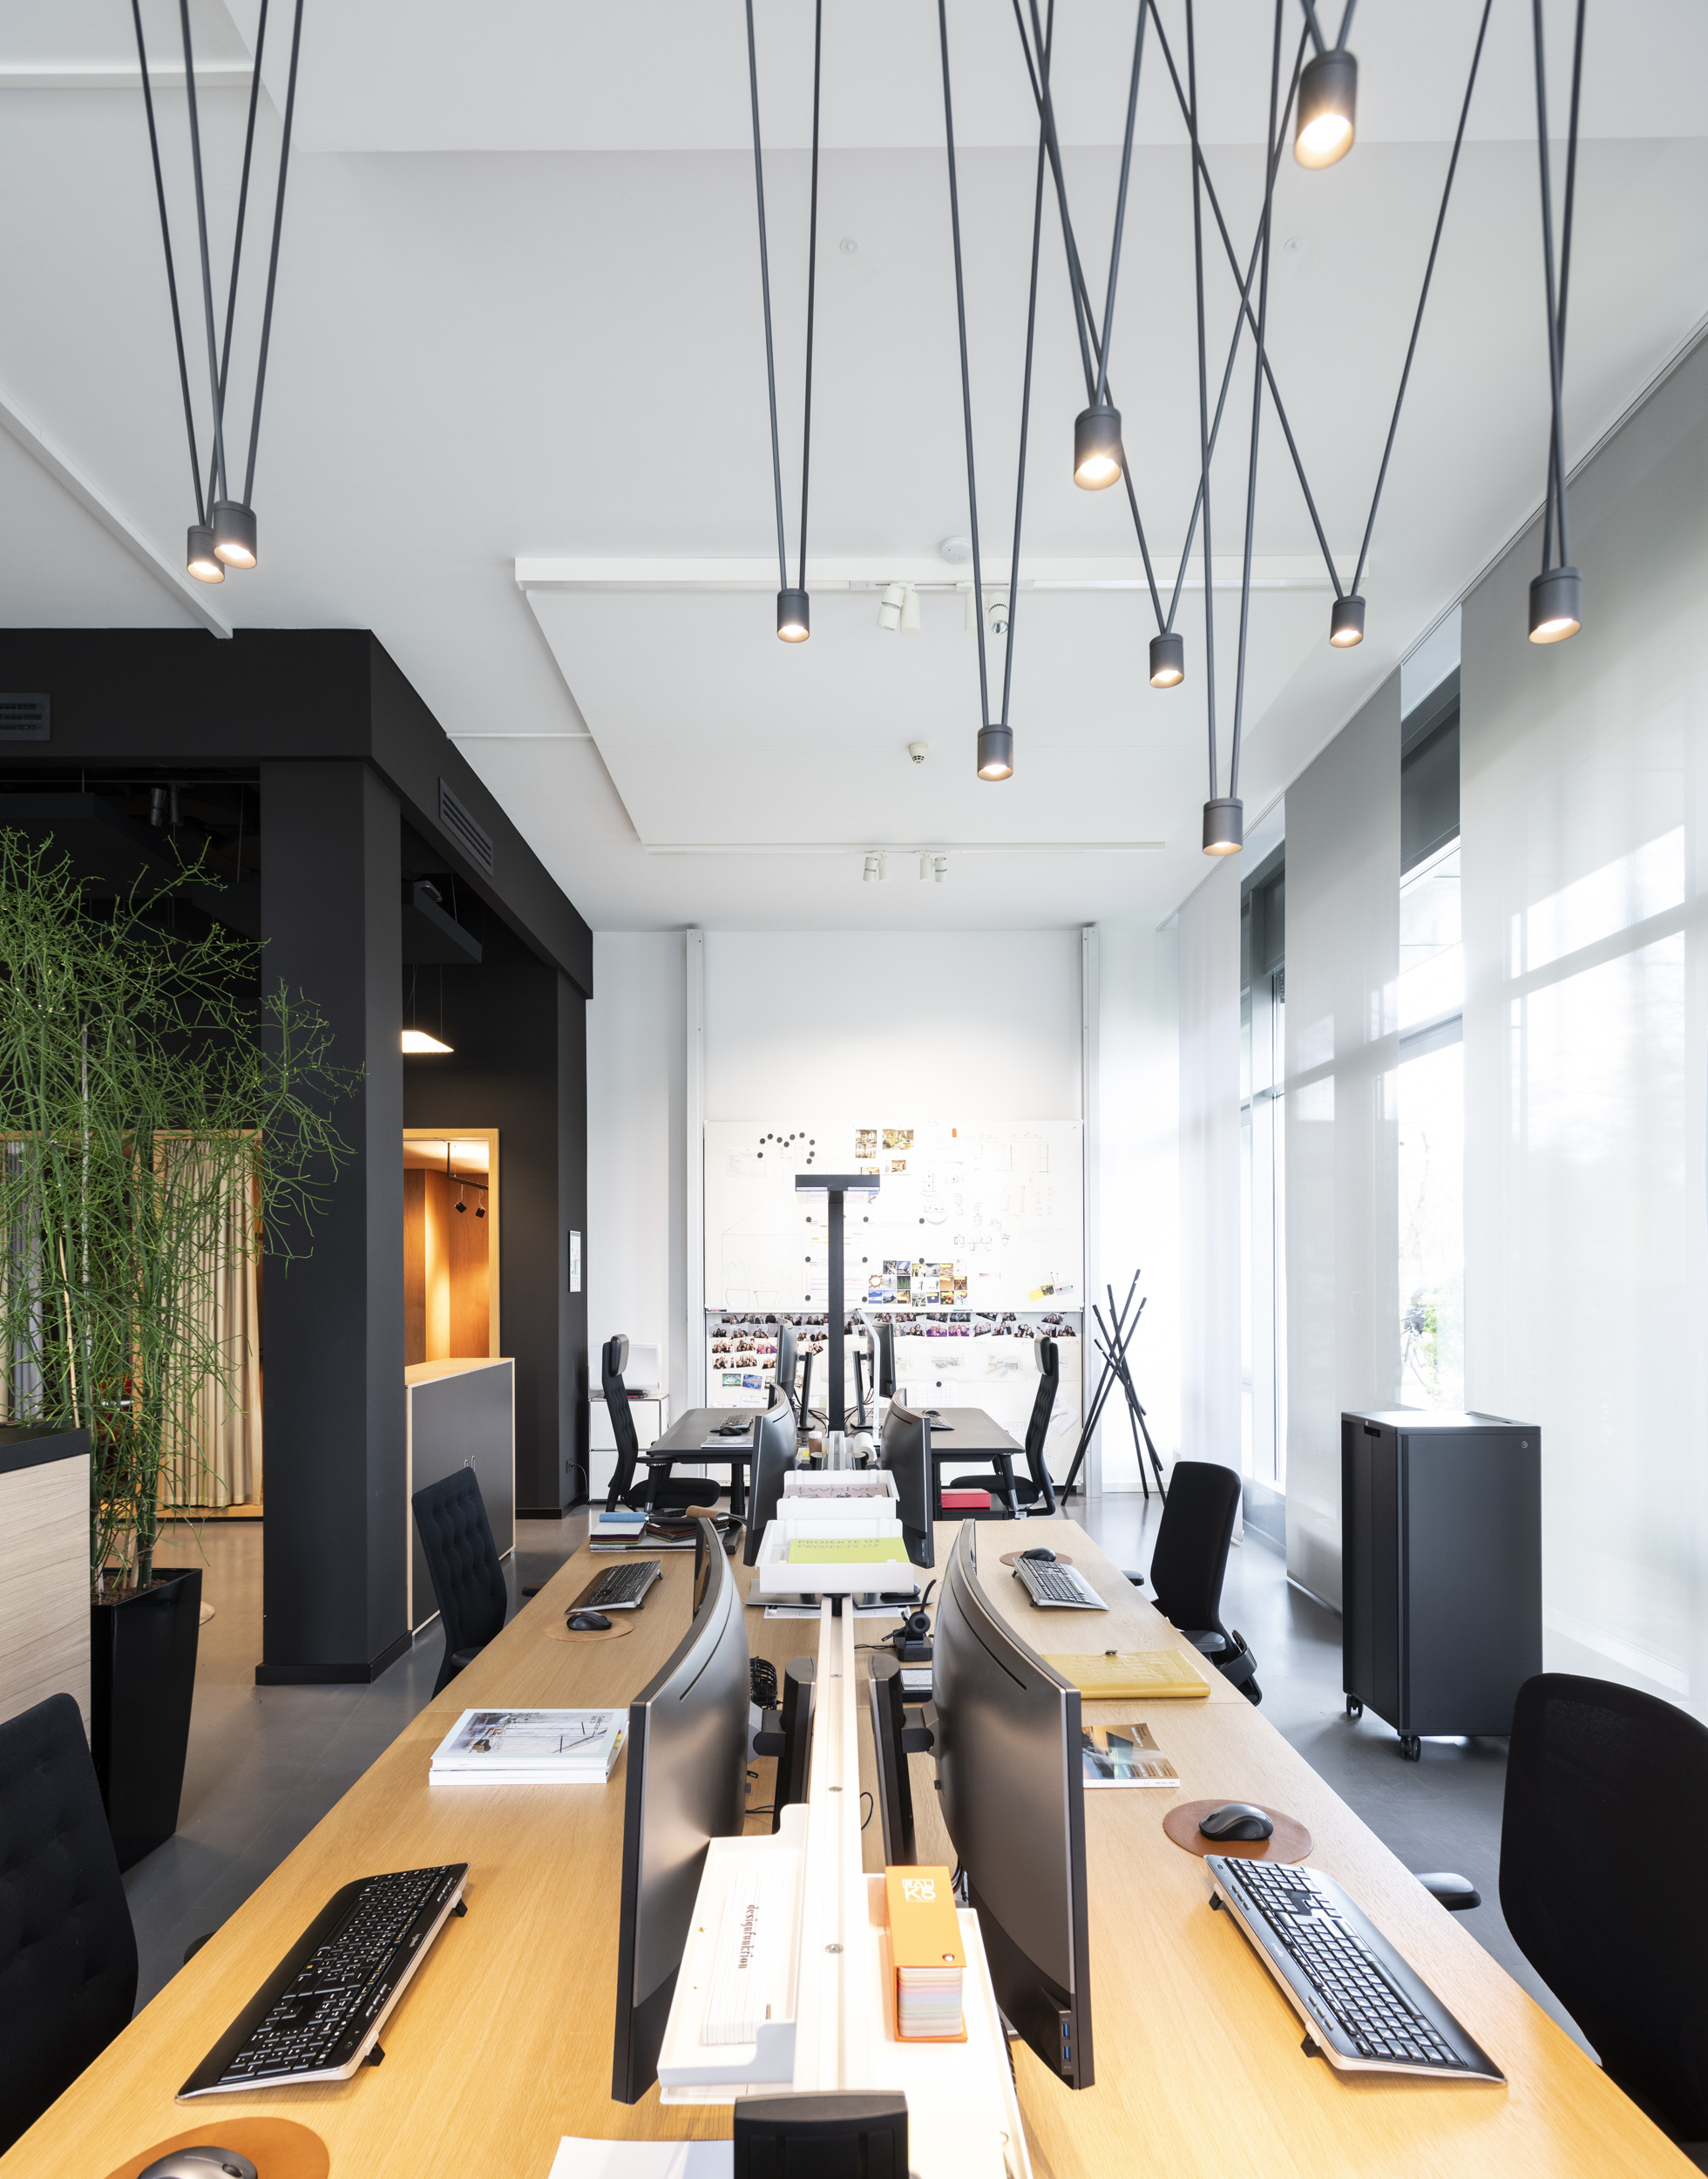 designfunktion new office